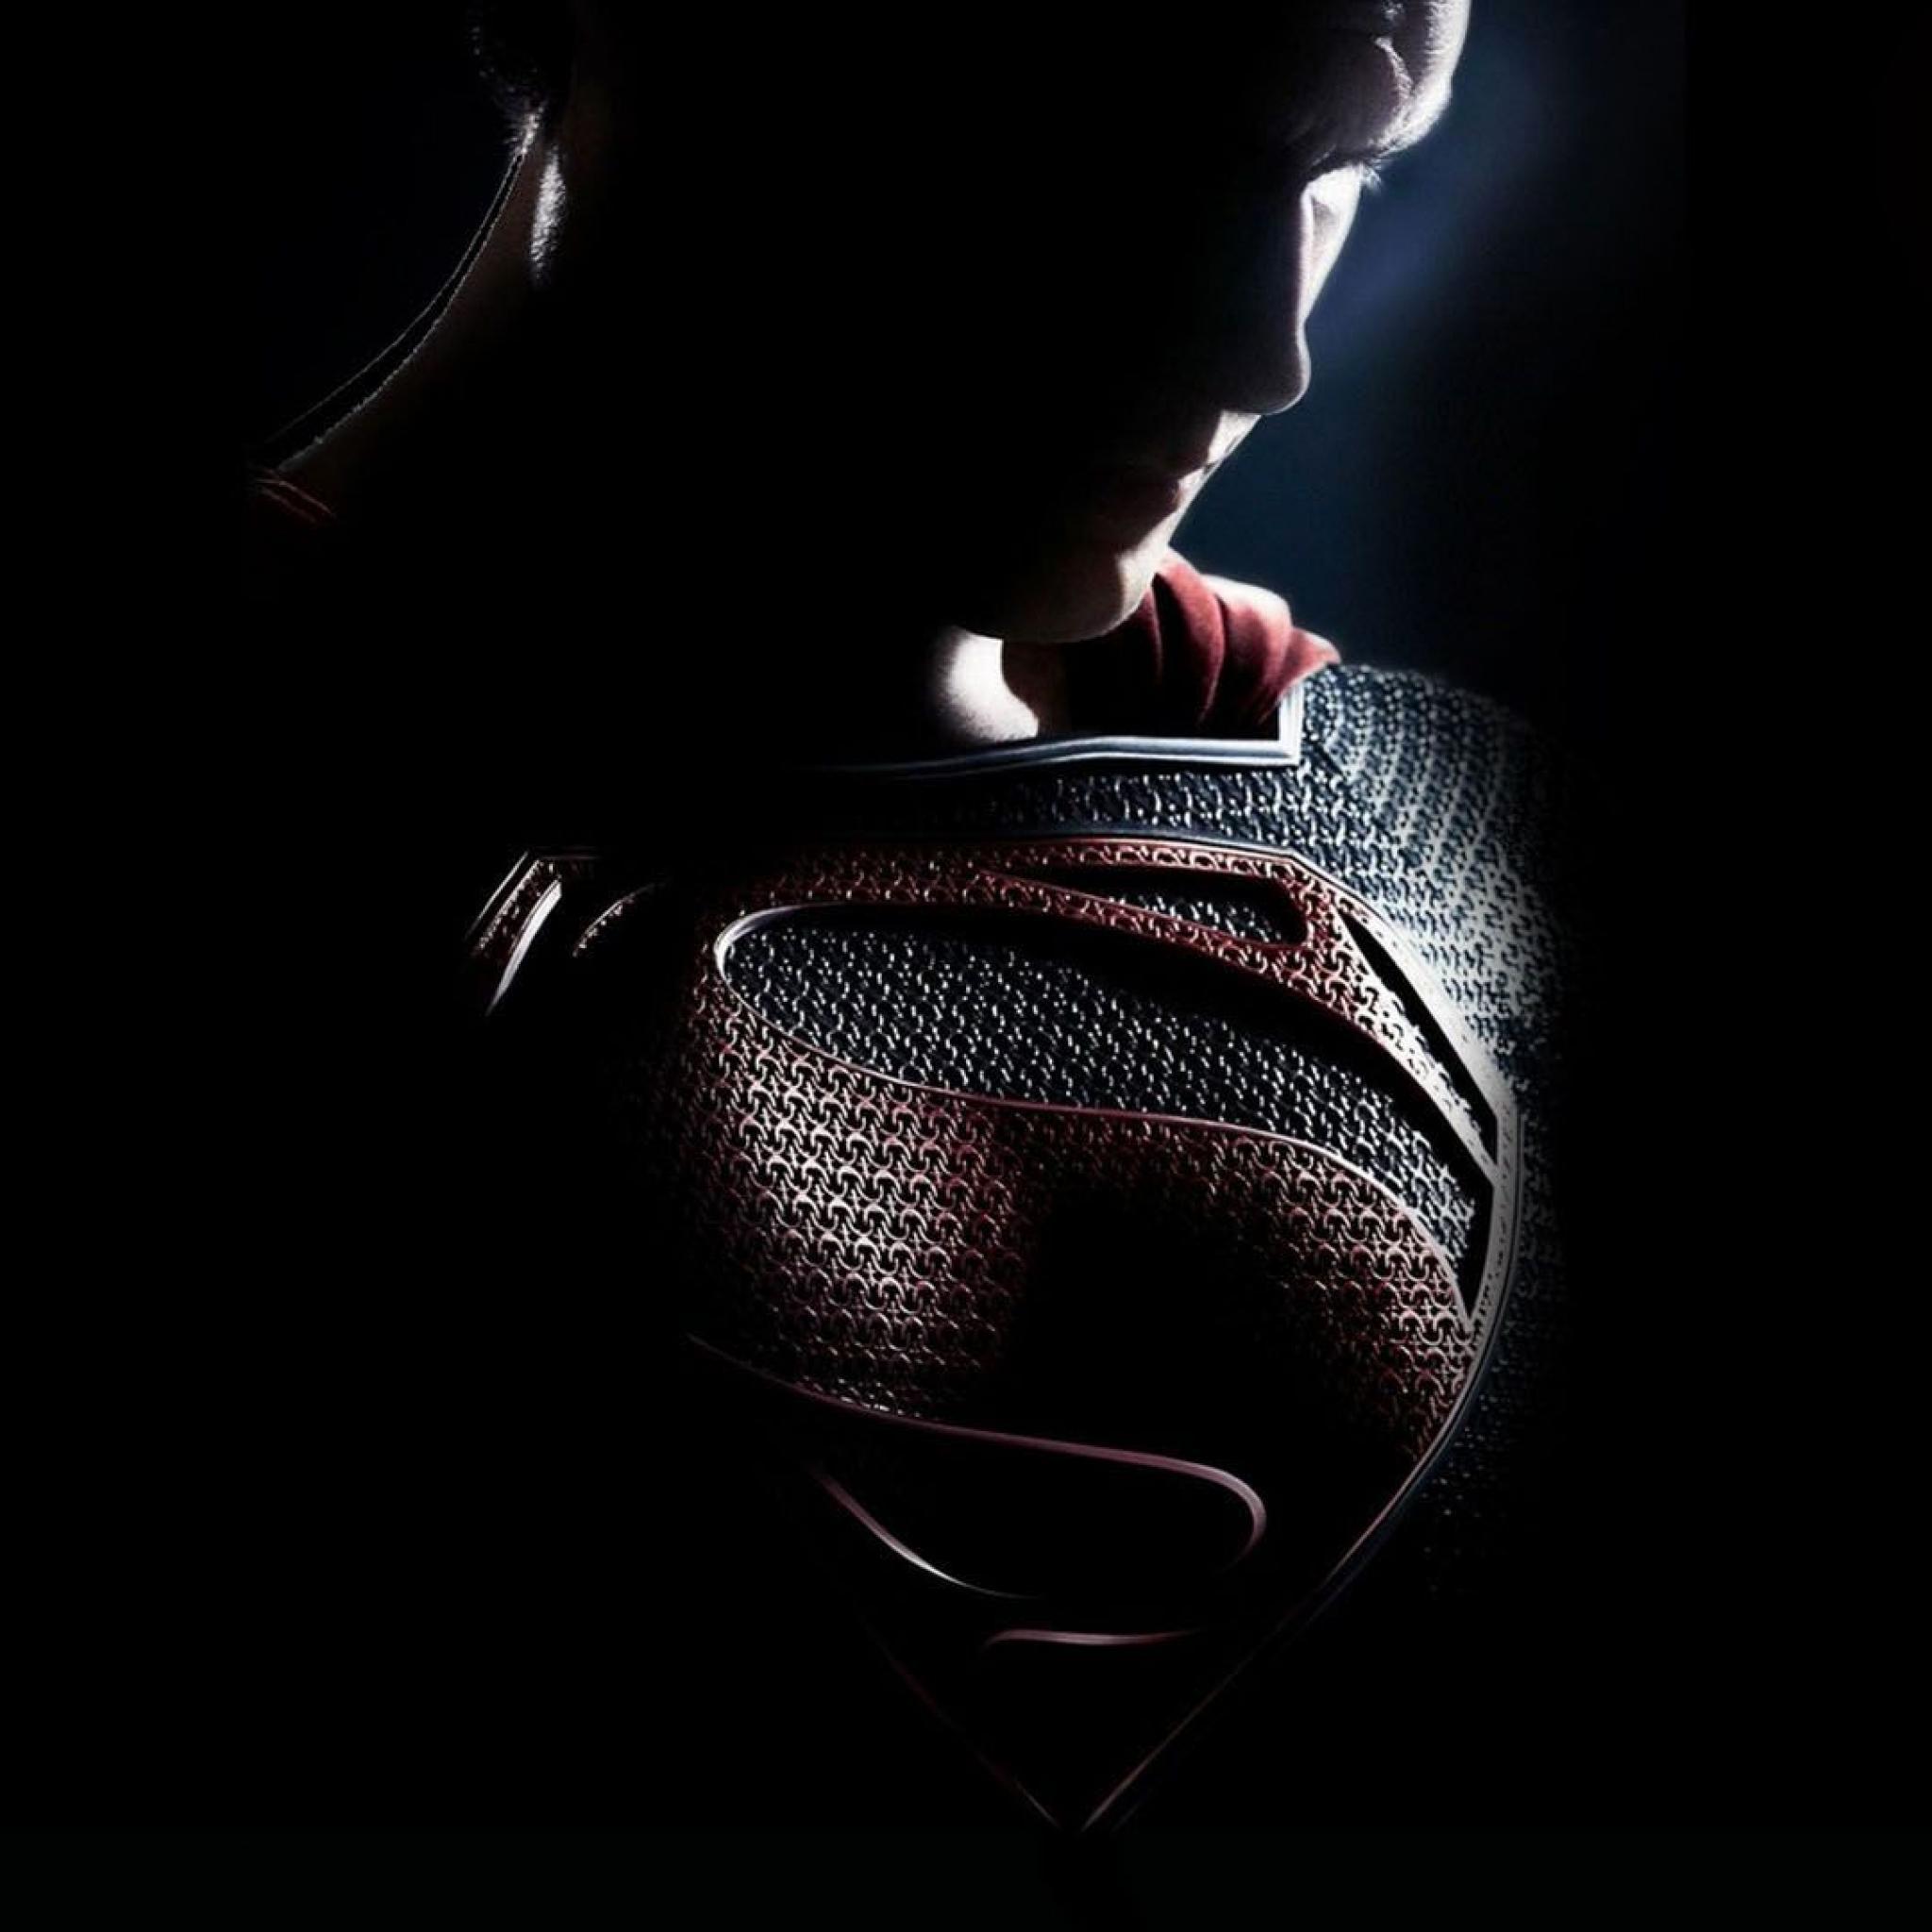 Superman-3Wallpapers-iPad-Retina